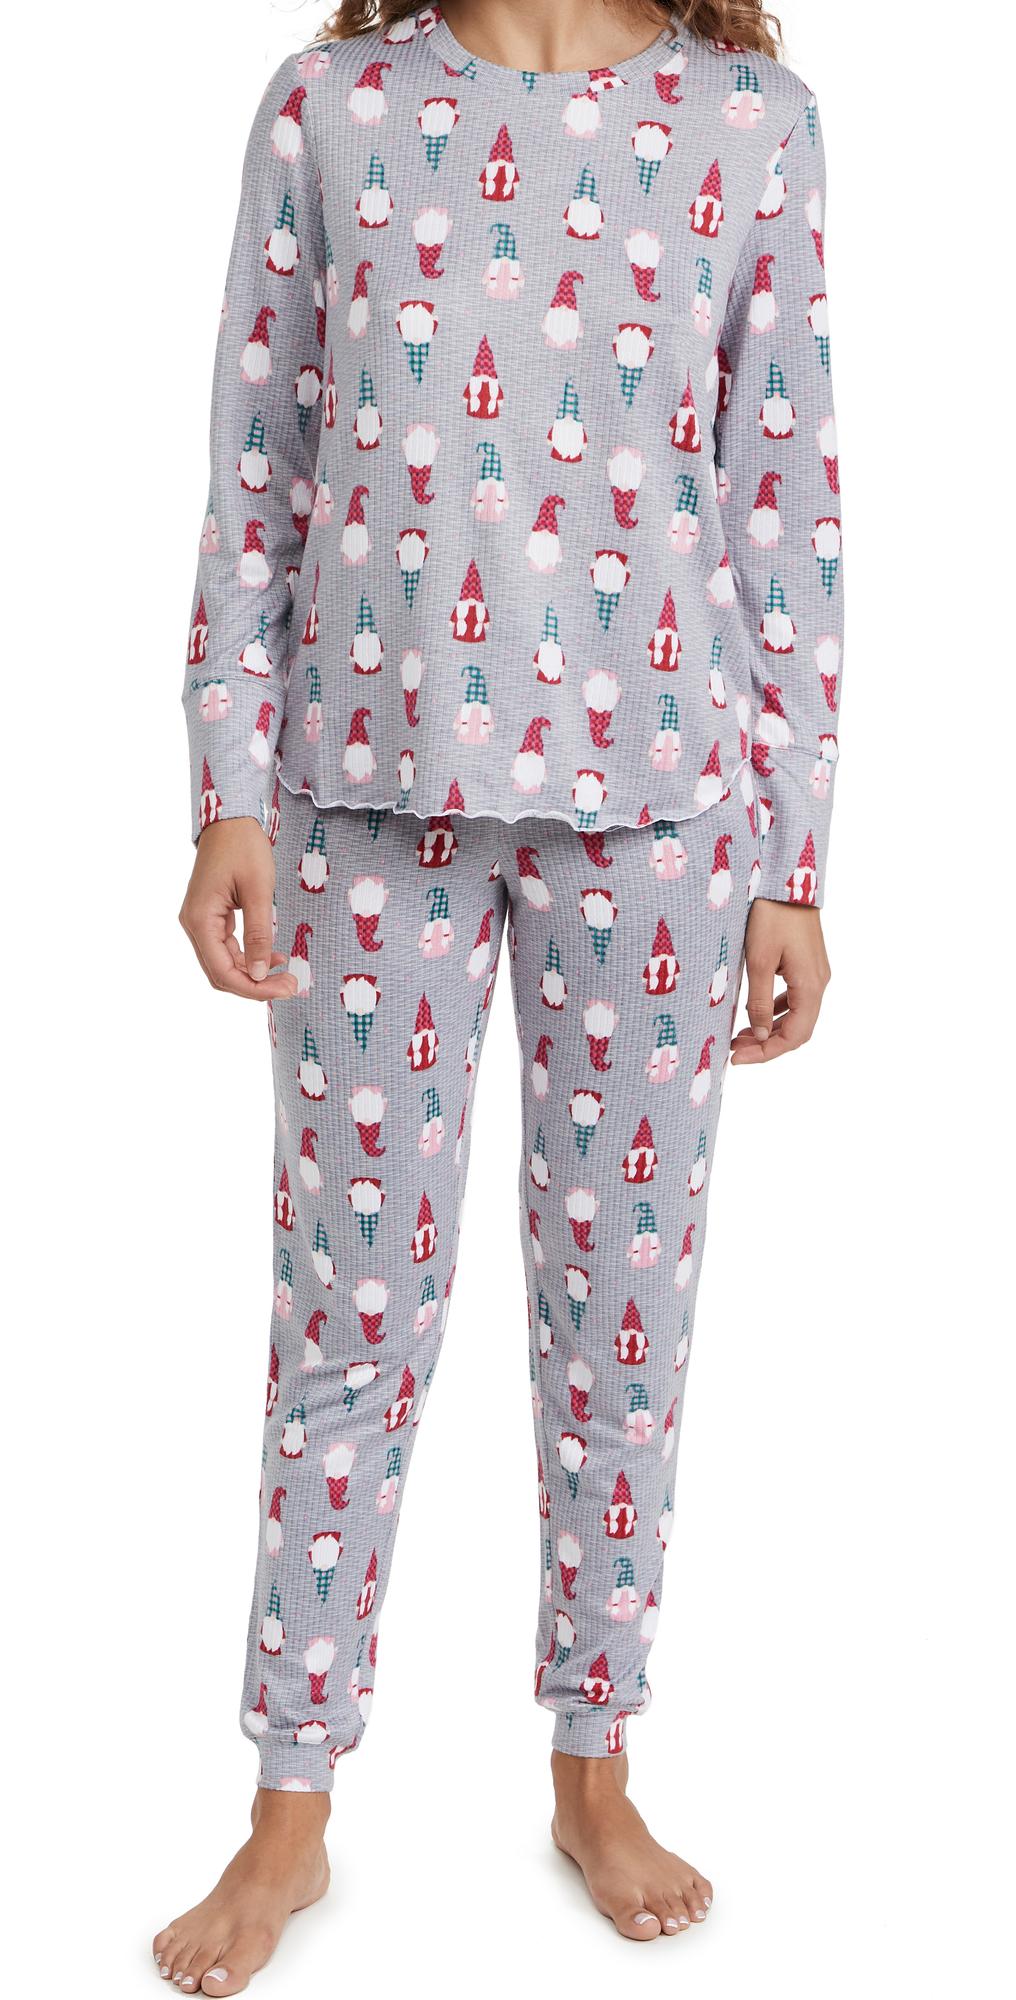 Sleepy Gnomes Jogger PJ Set